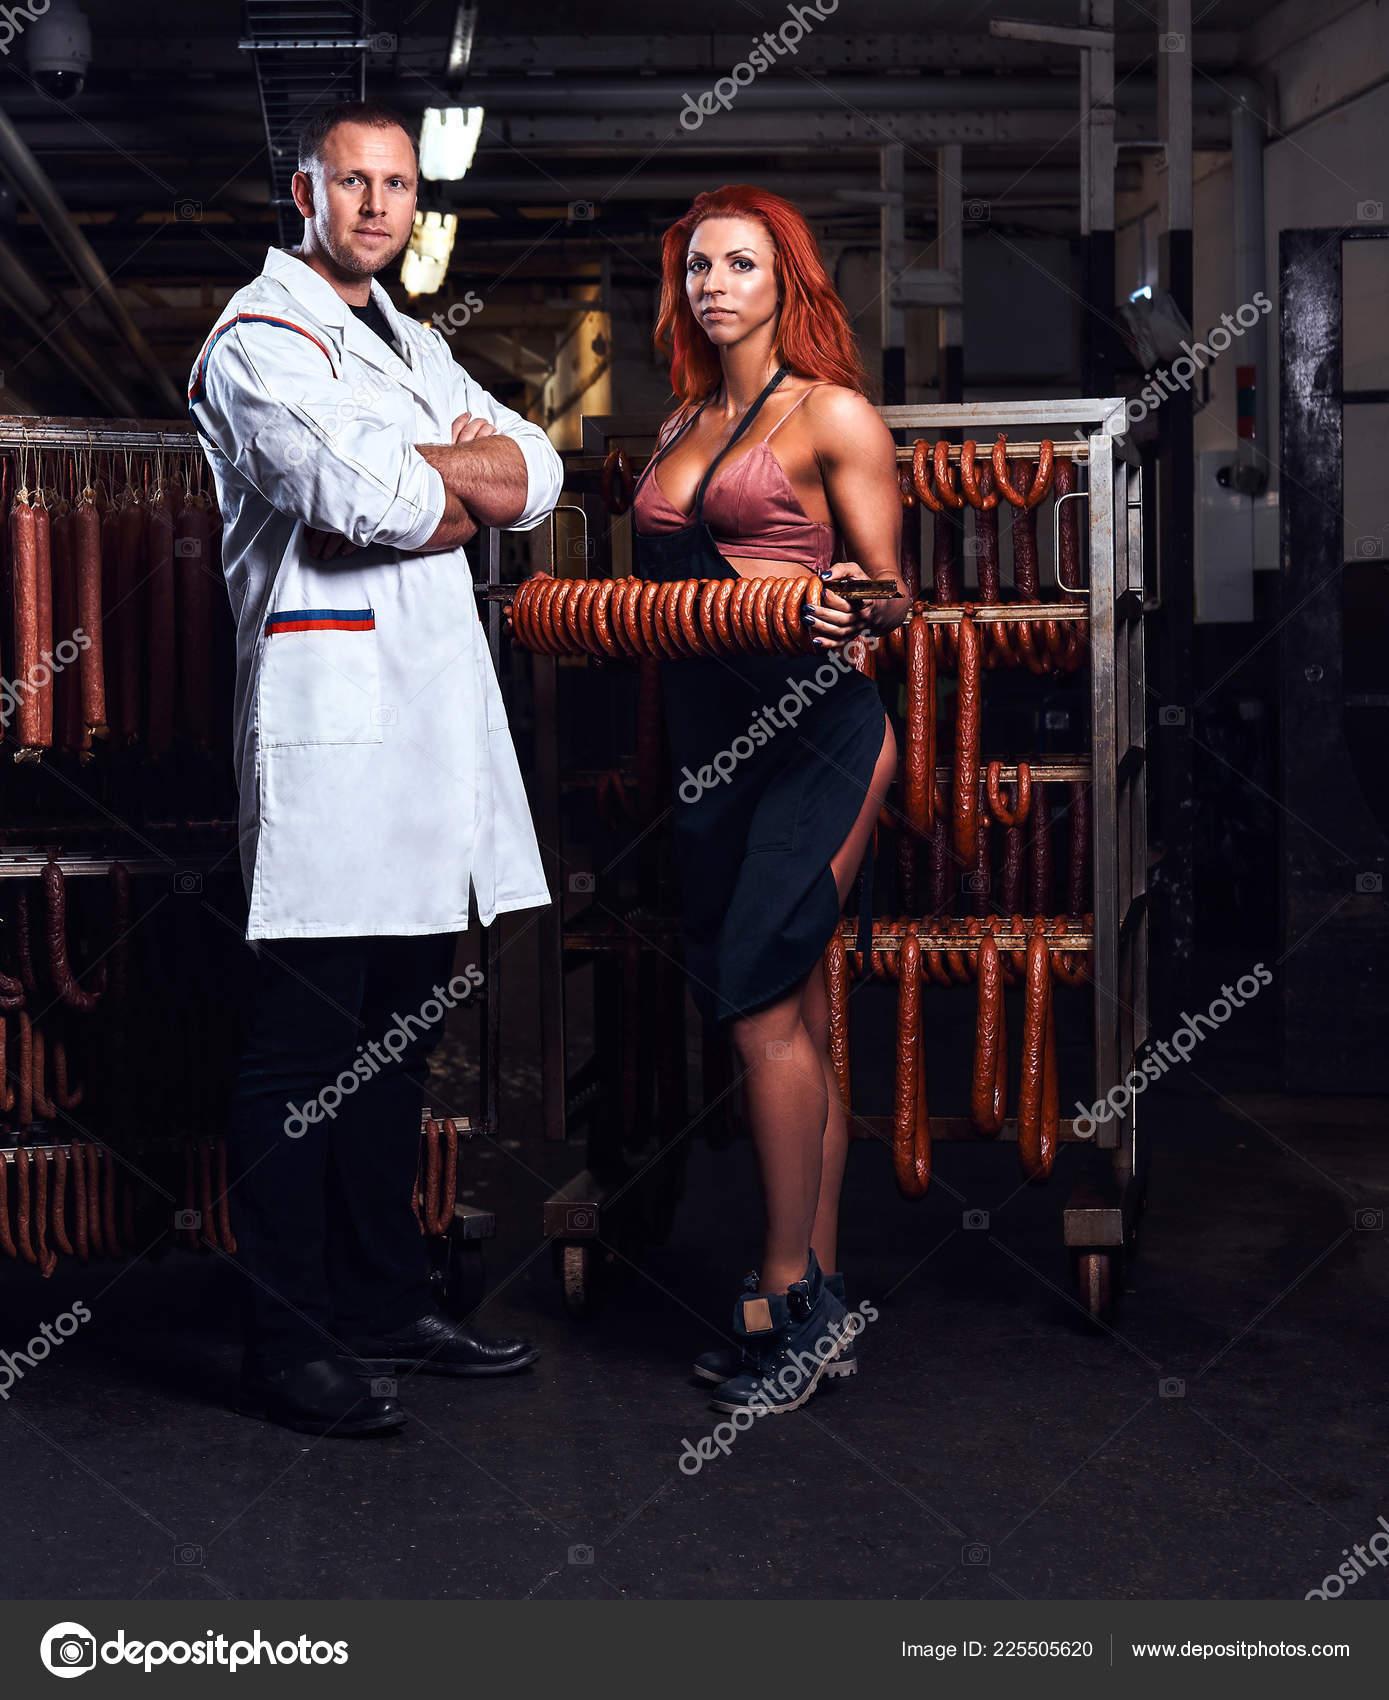 Sexy Butcher